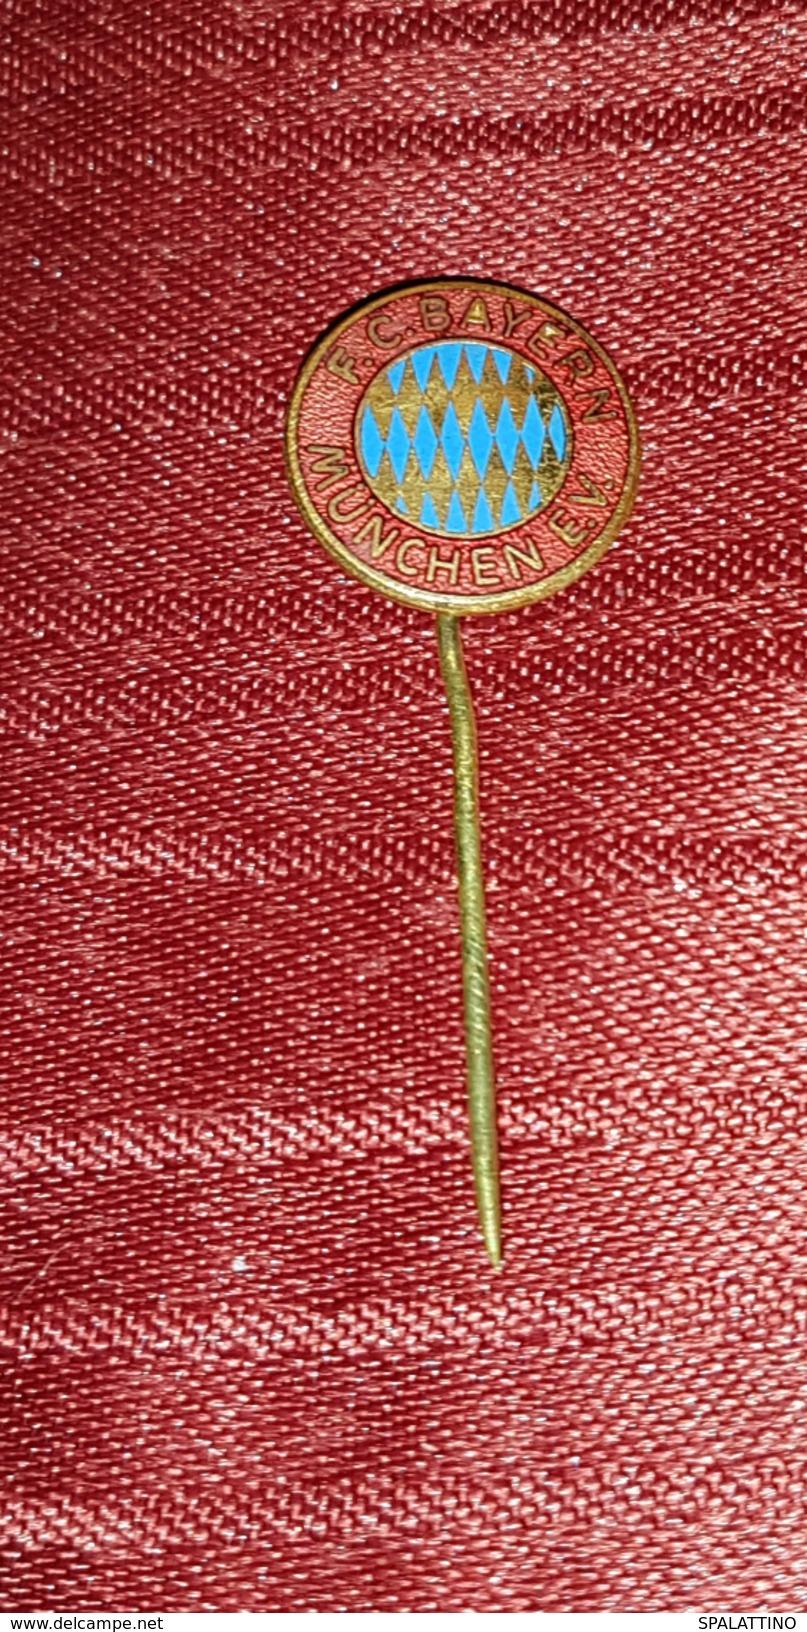 FC BAYERN MÜNCHEN, VINTAGE ENAMEL PIN BADGE - Fussball